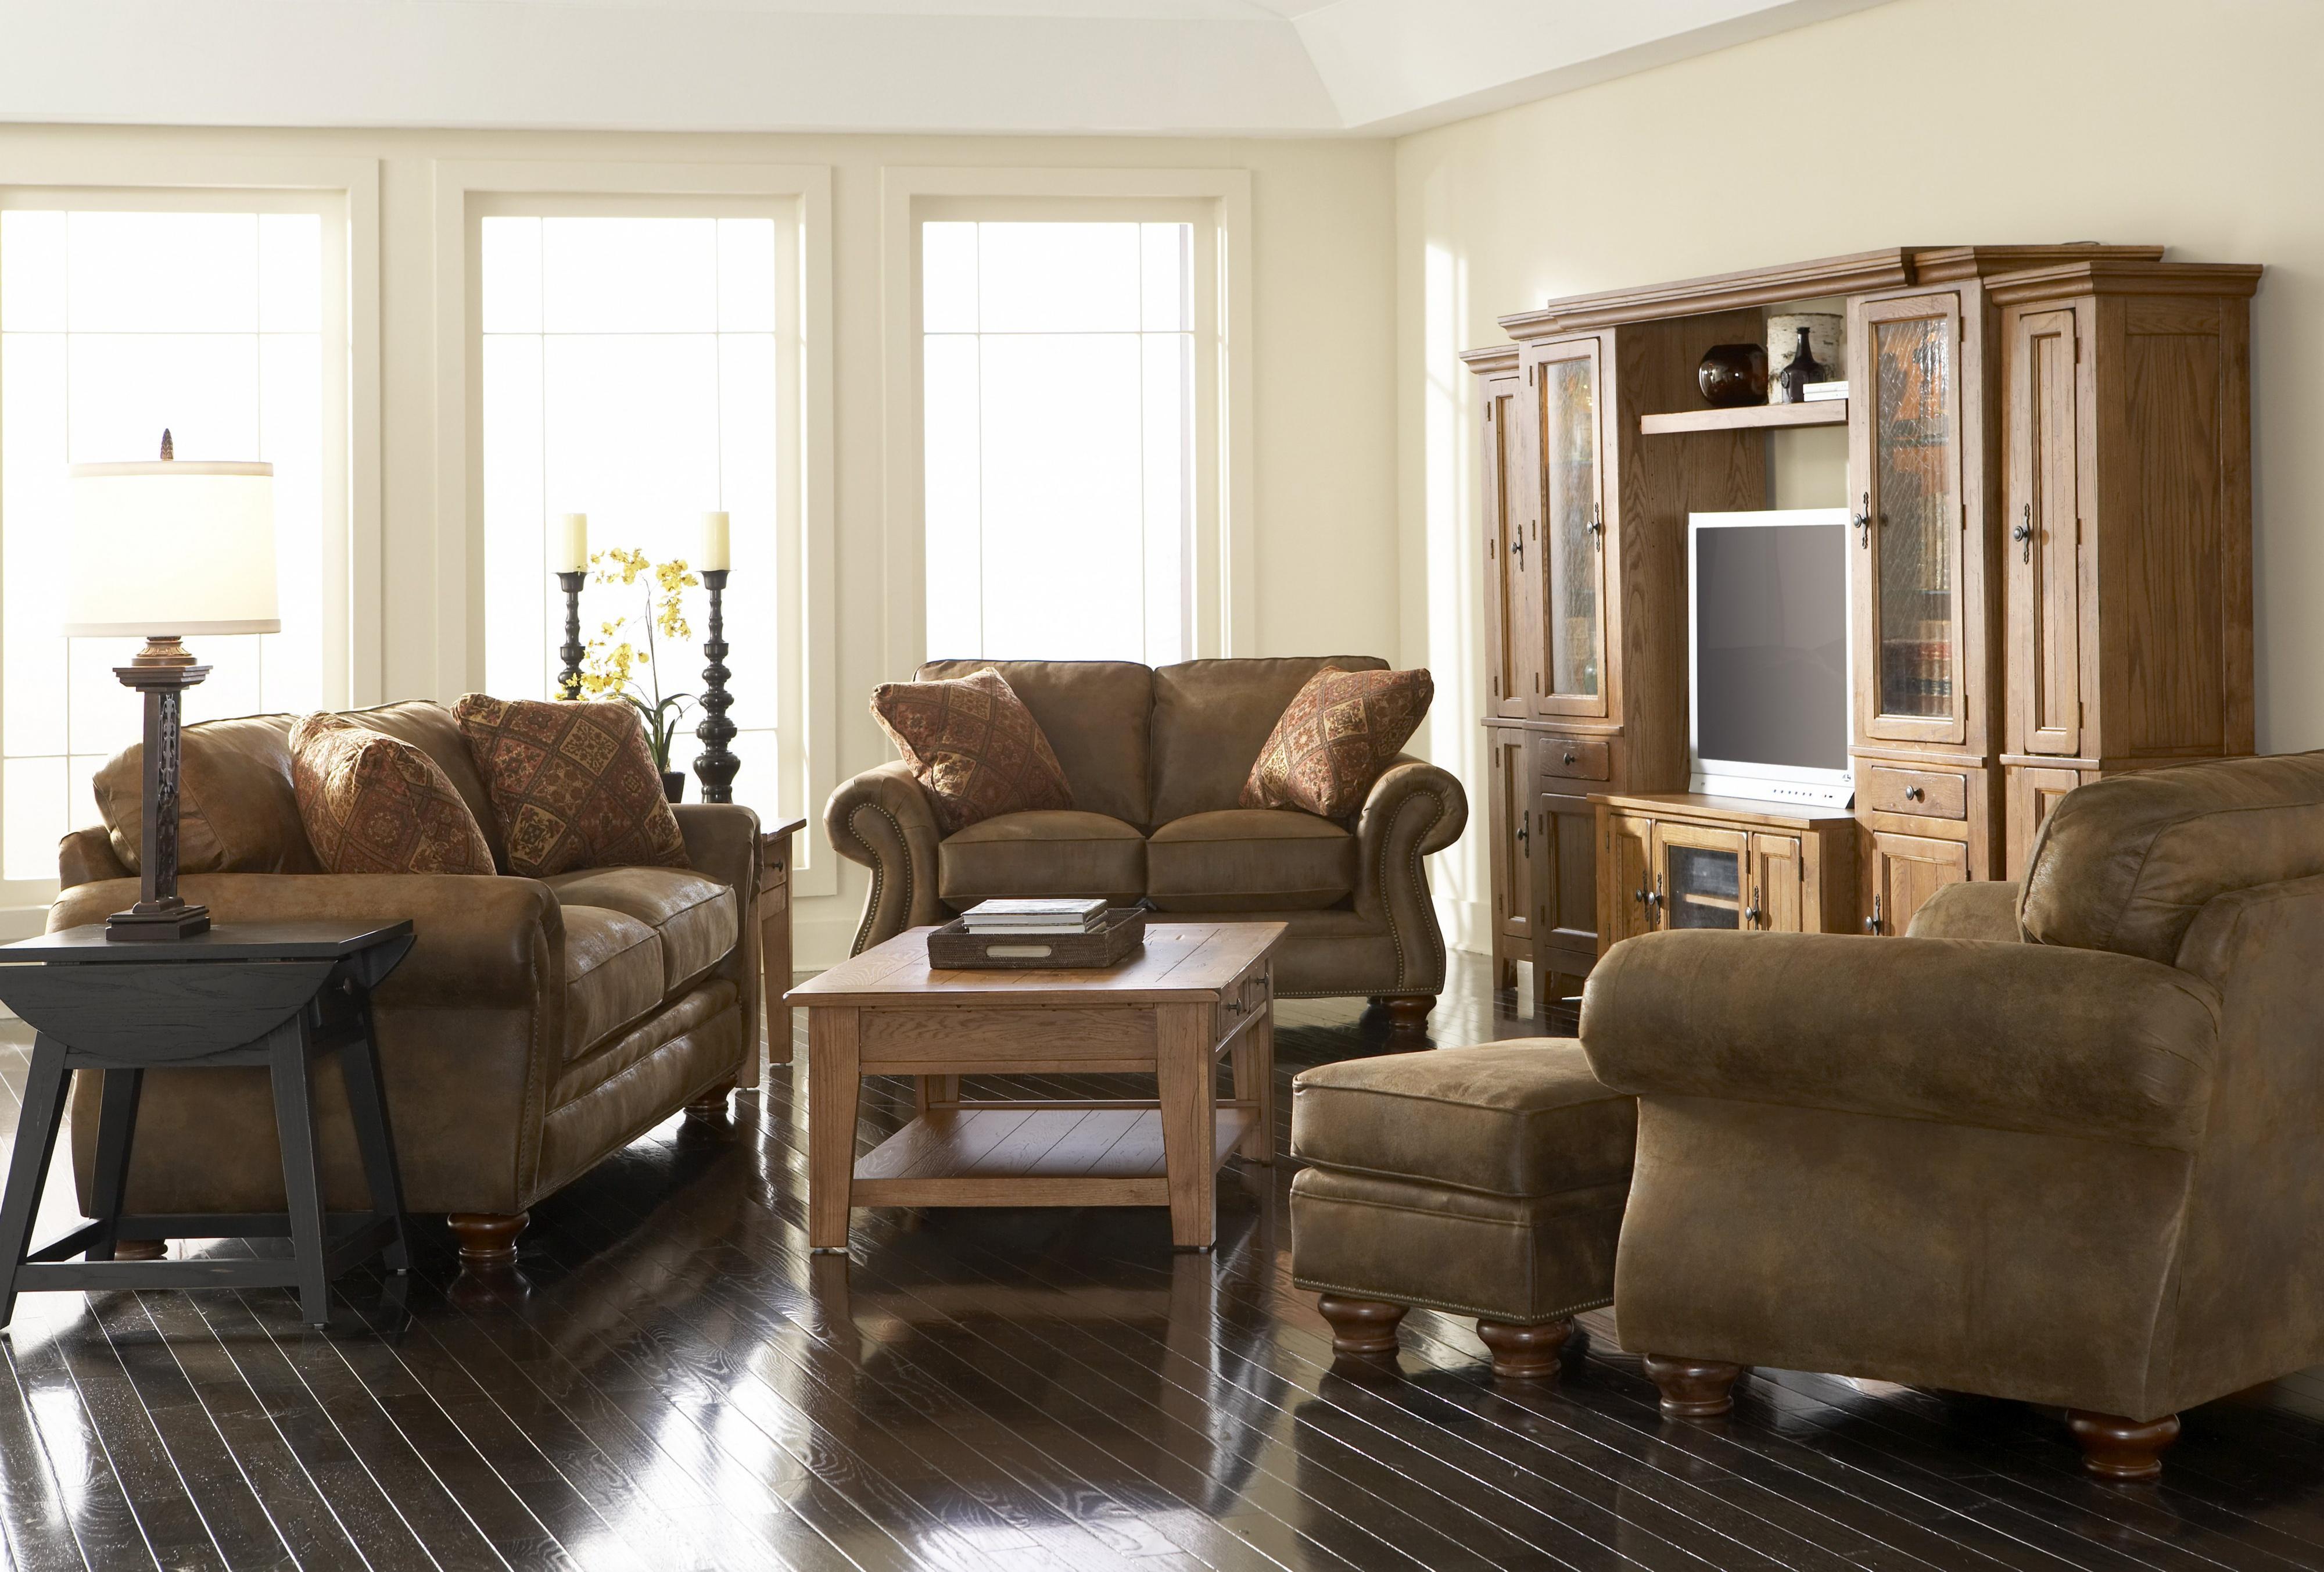 Broyhill Furniture Laramie Sofa w Nail Head TrimColders